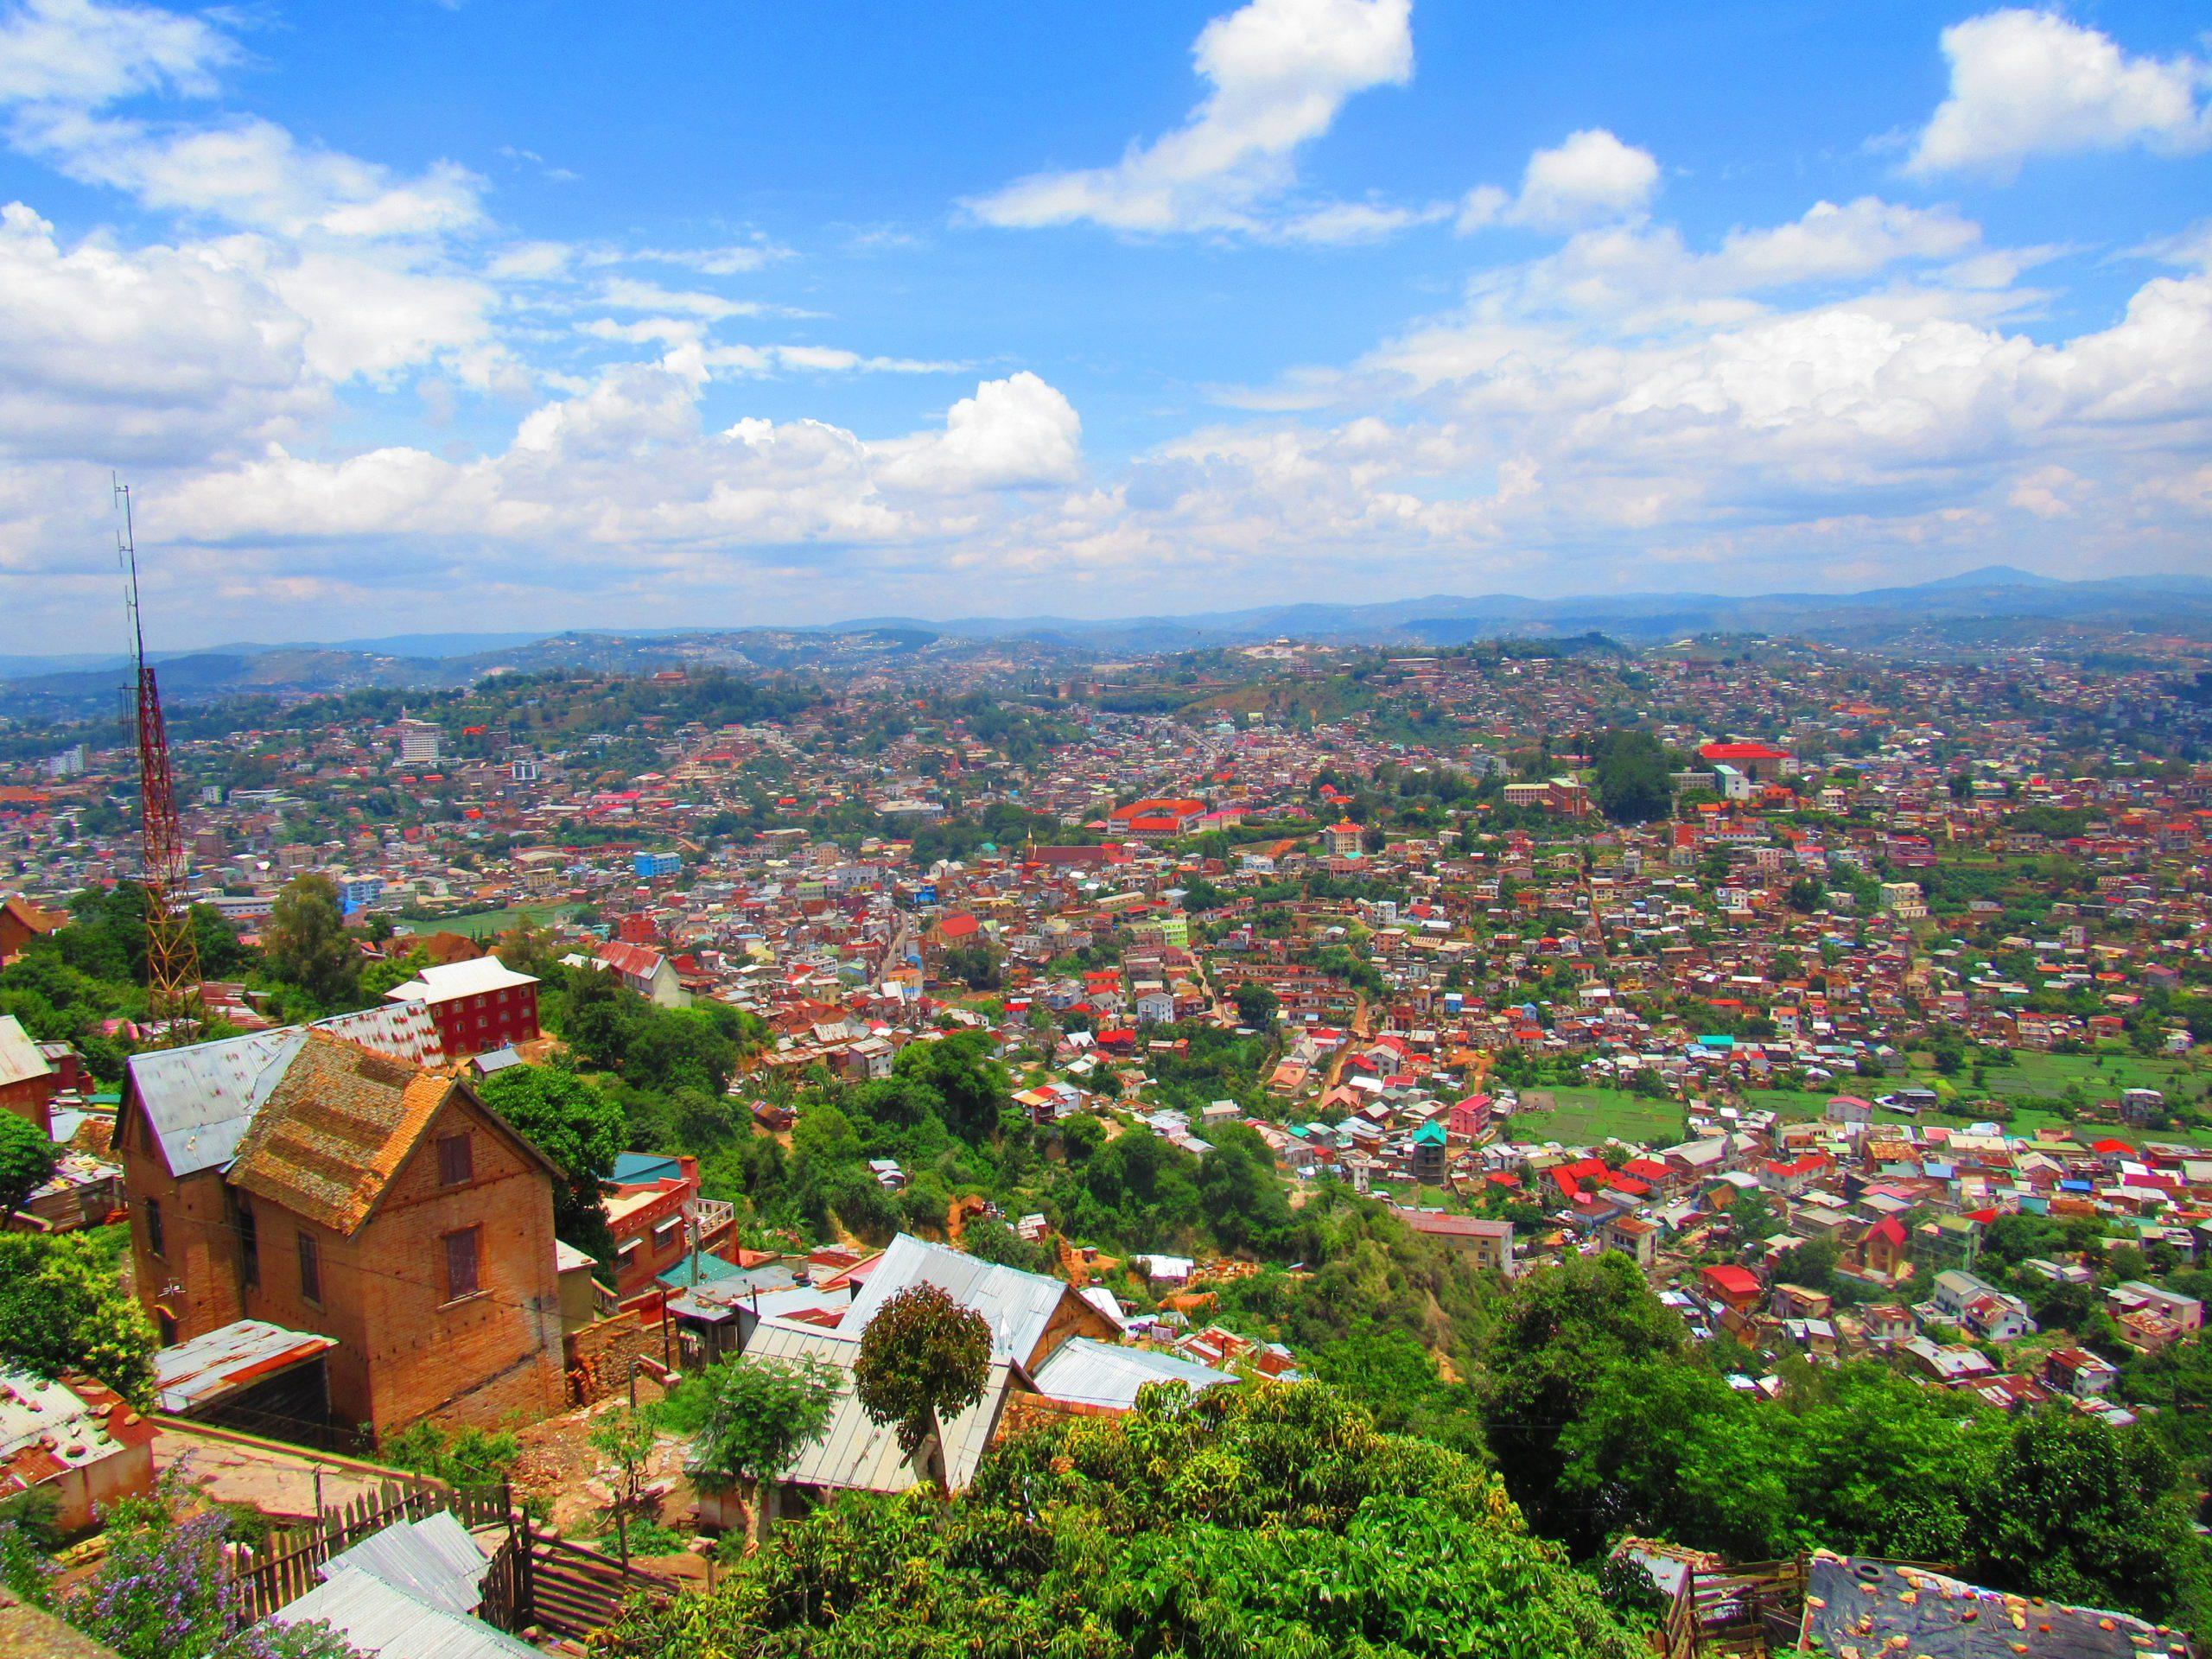 View over the city of Antananarivo on sunny day